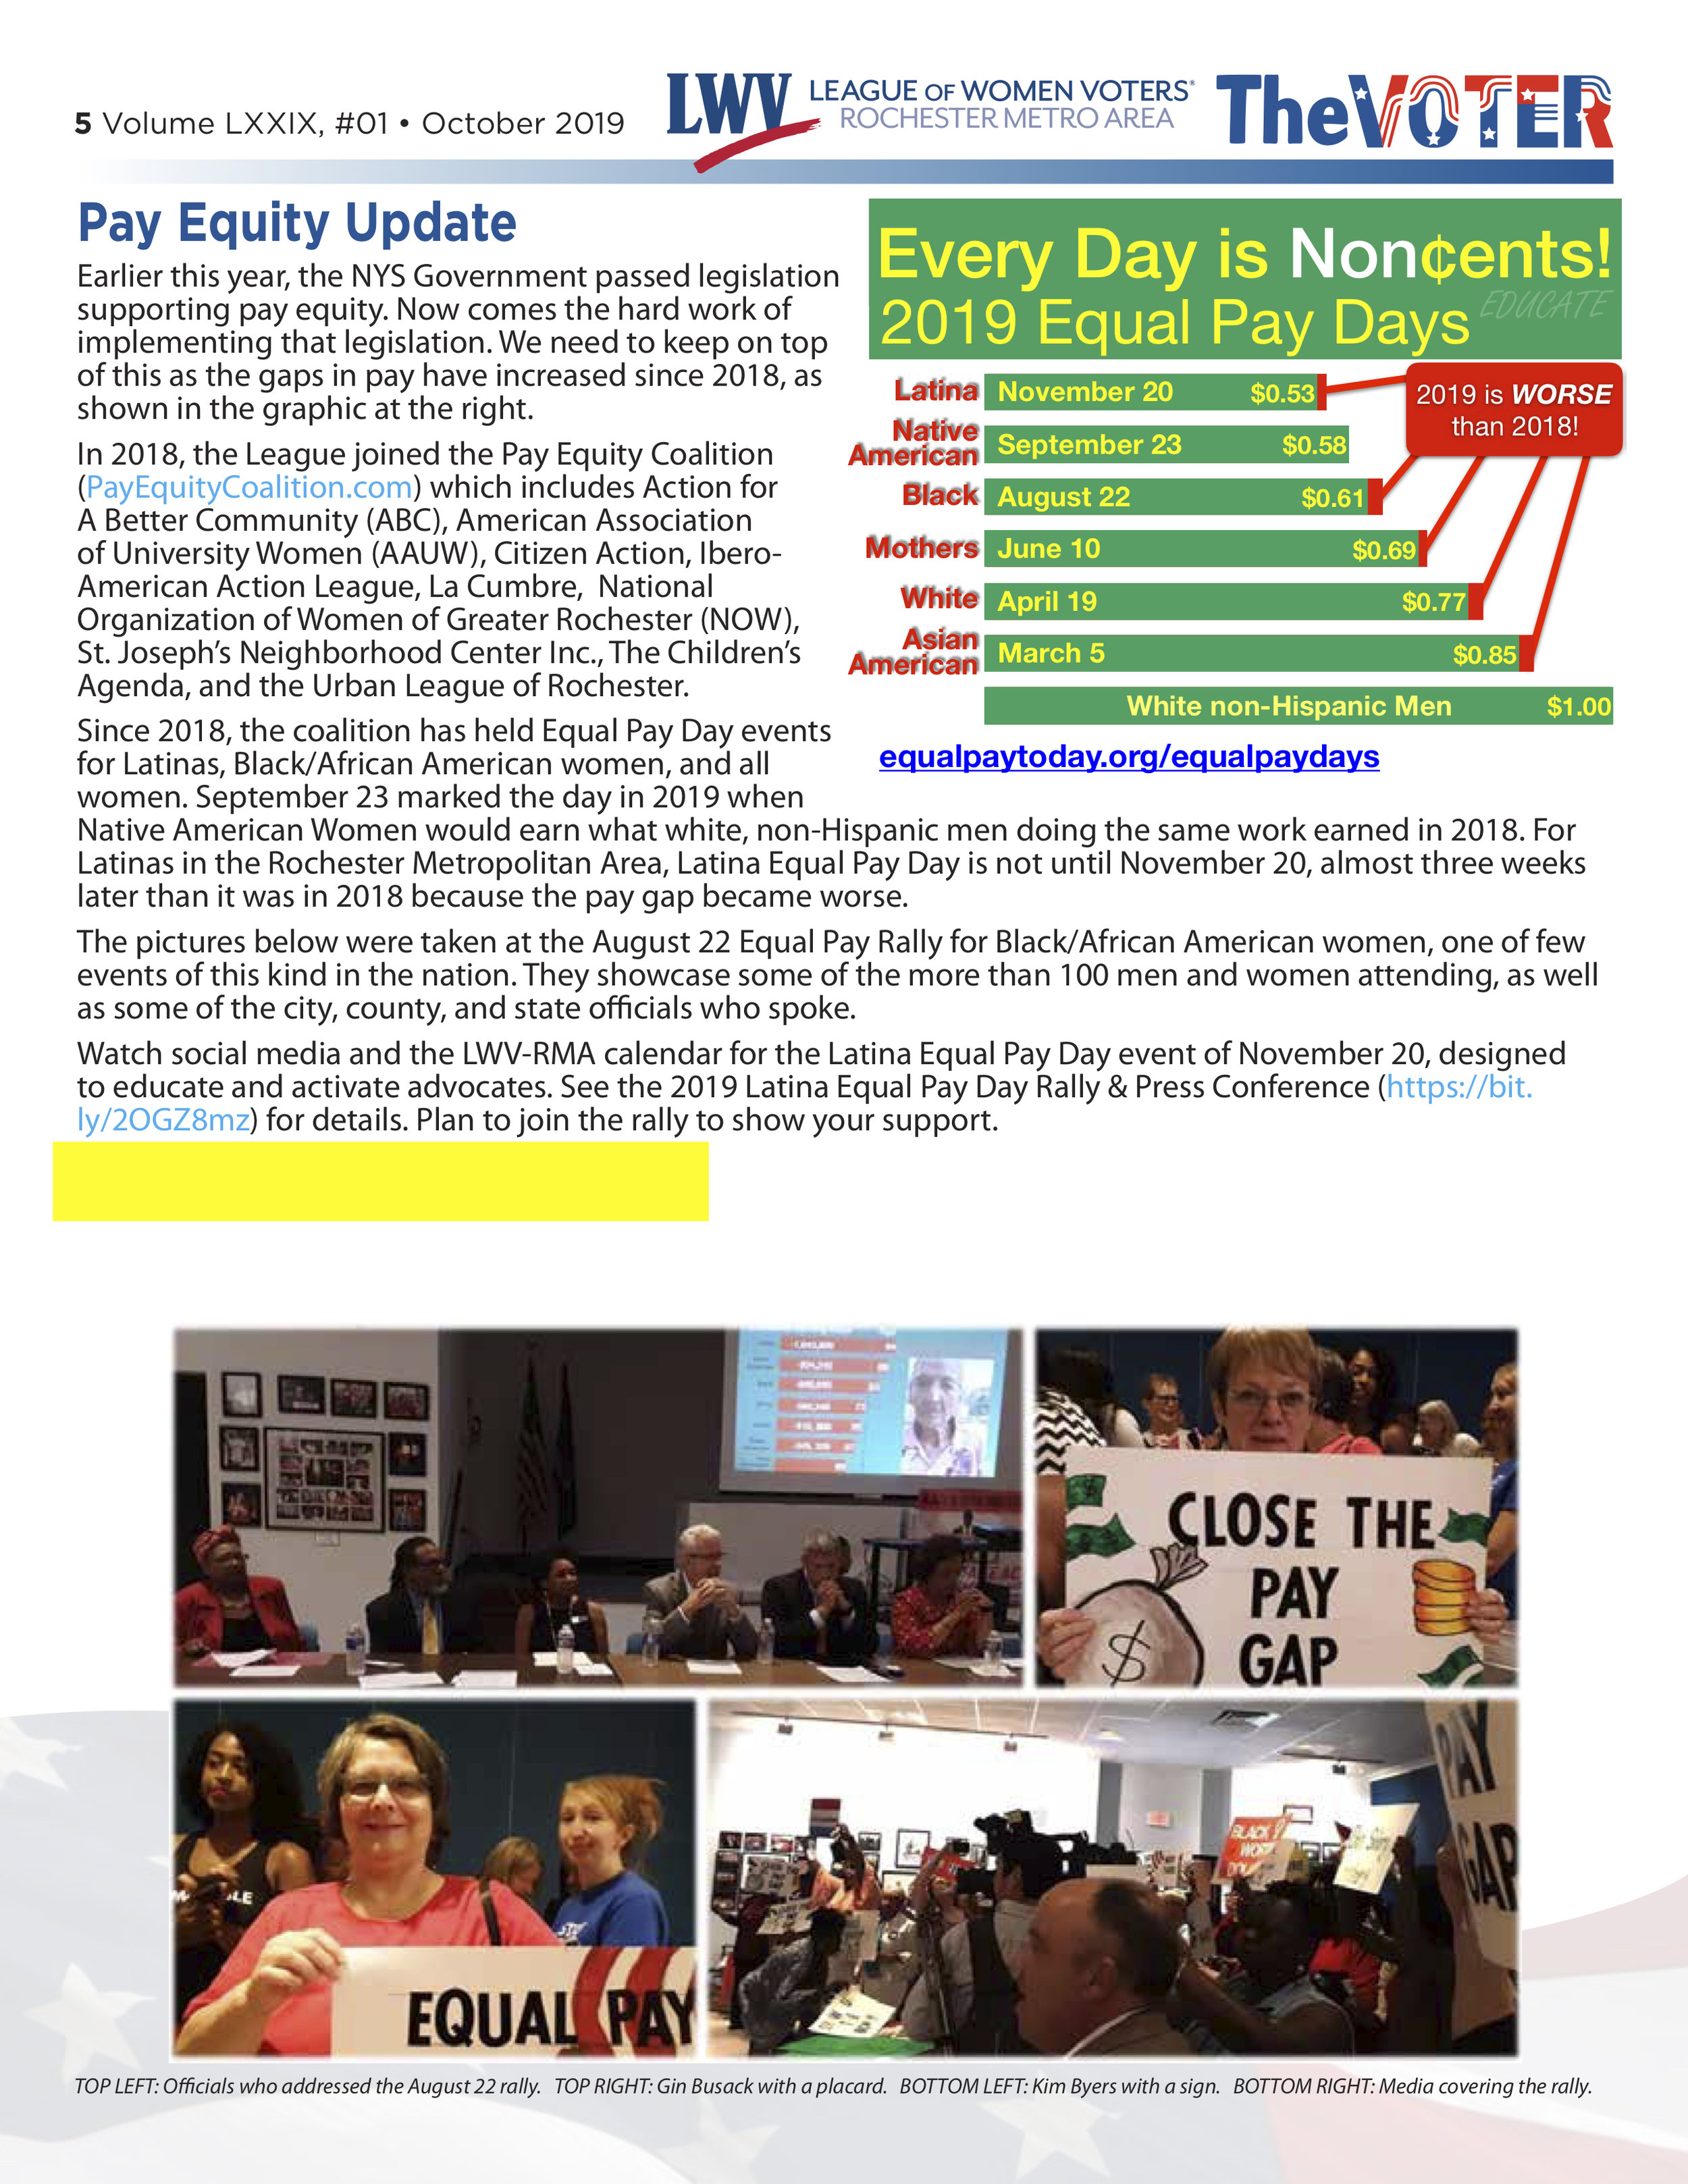 League of Women Voters article